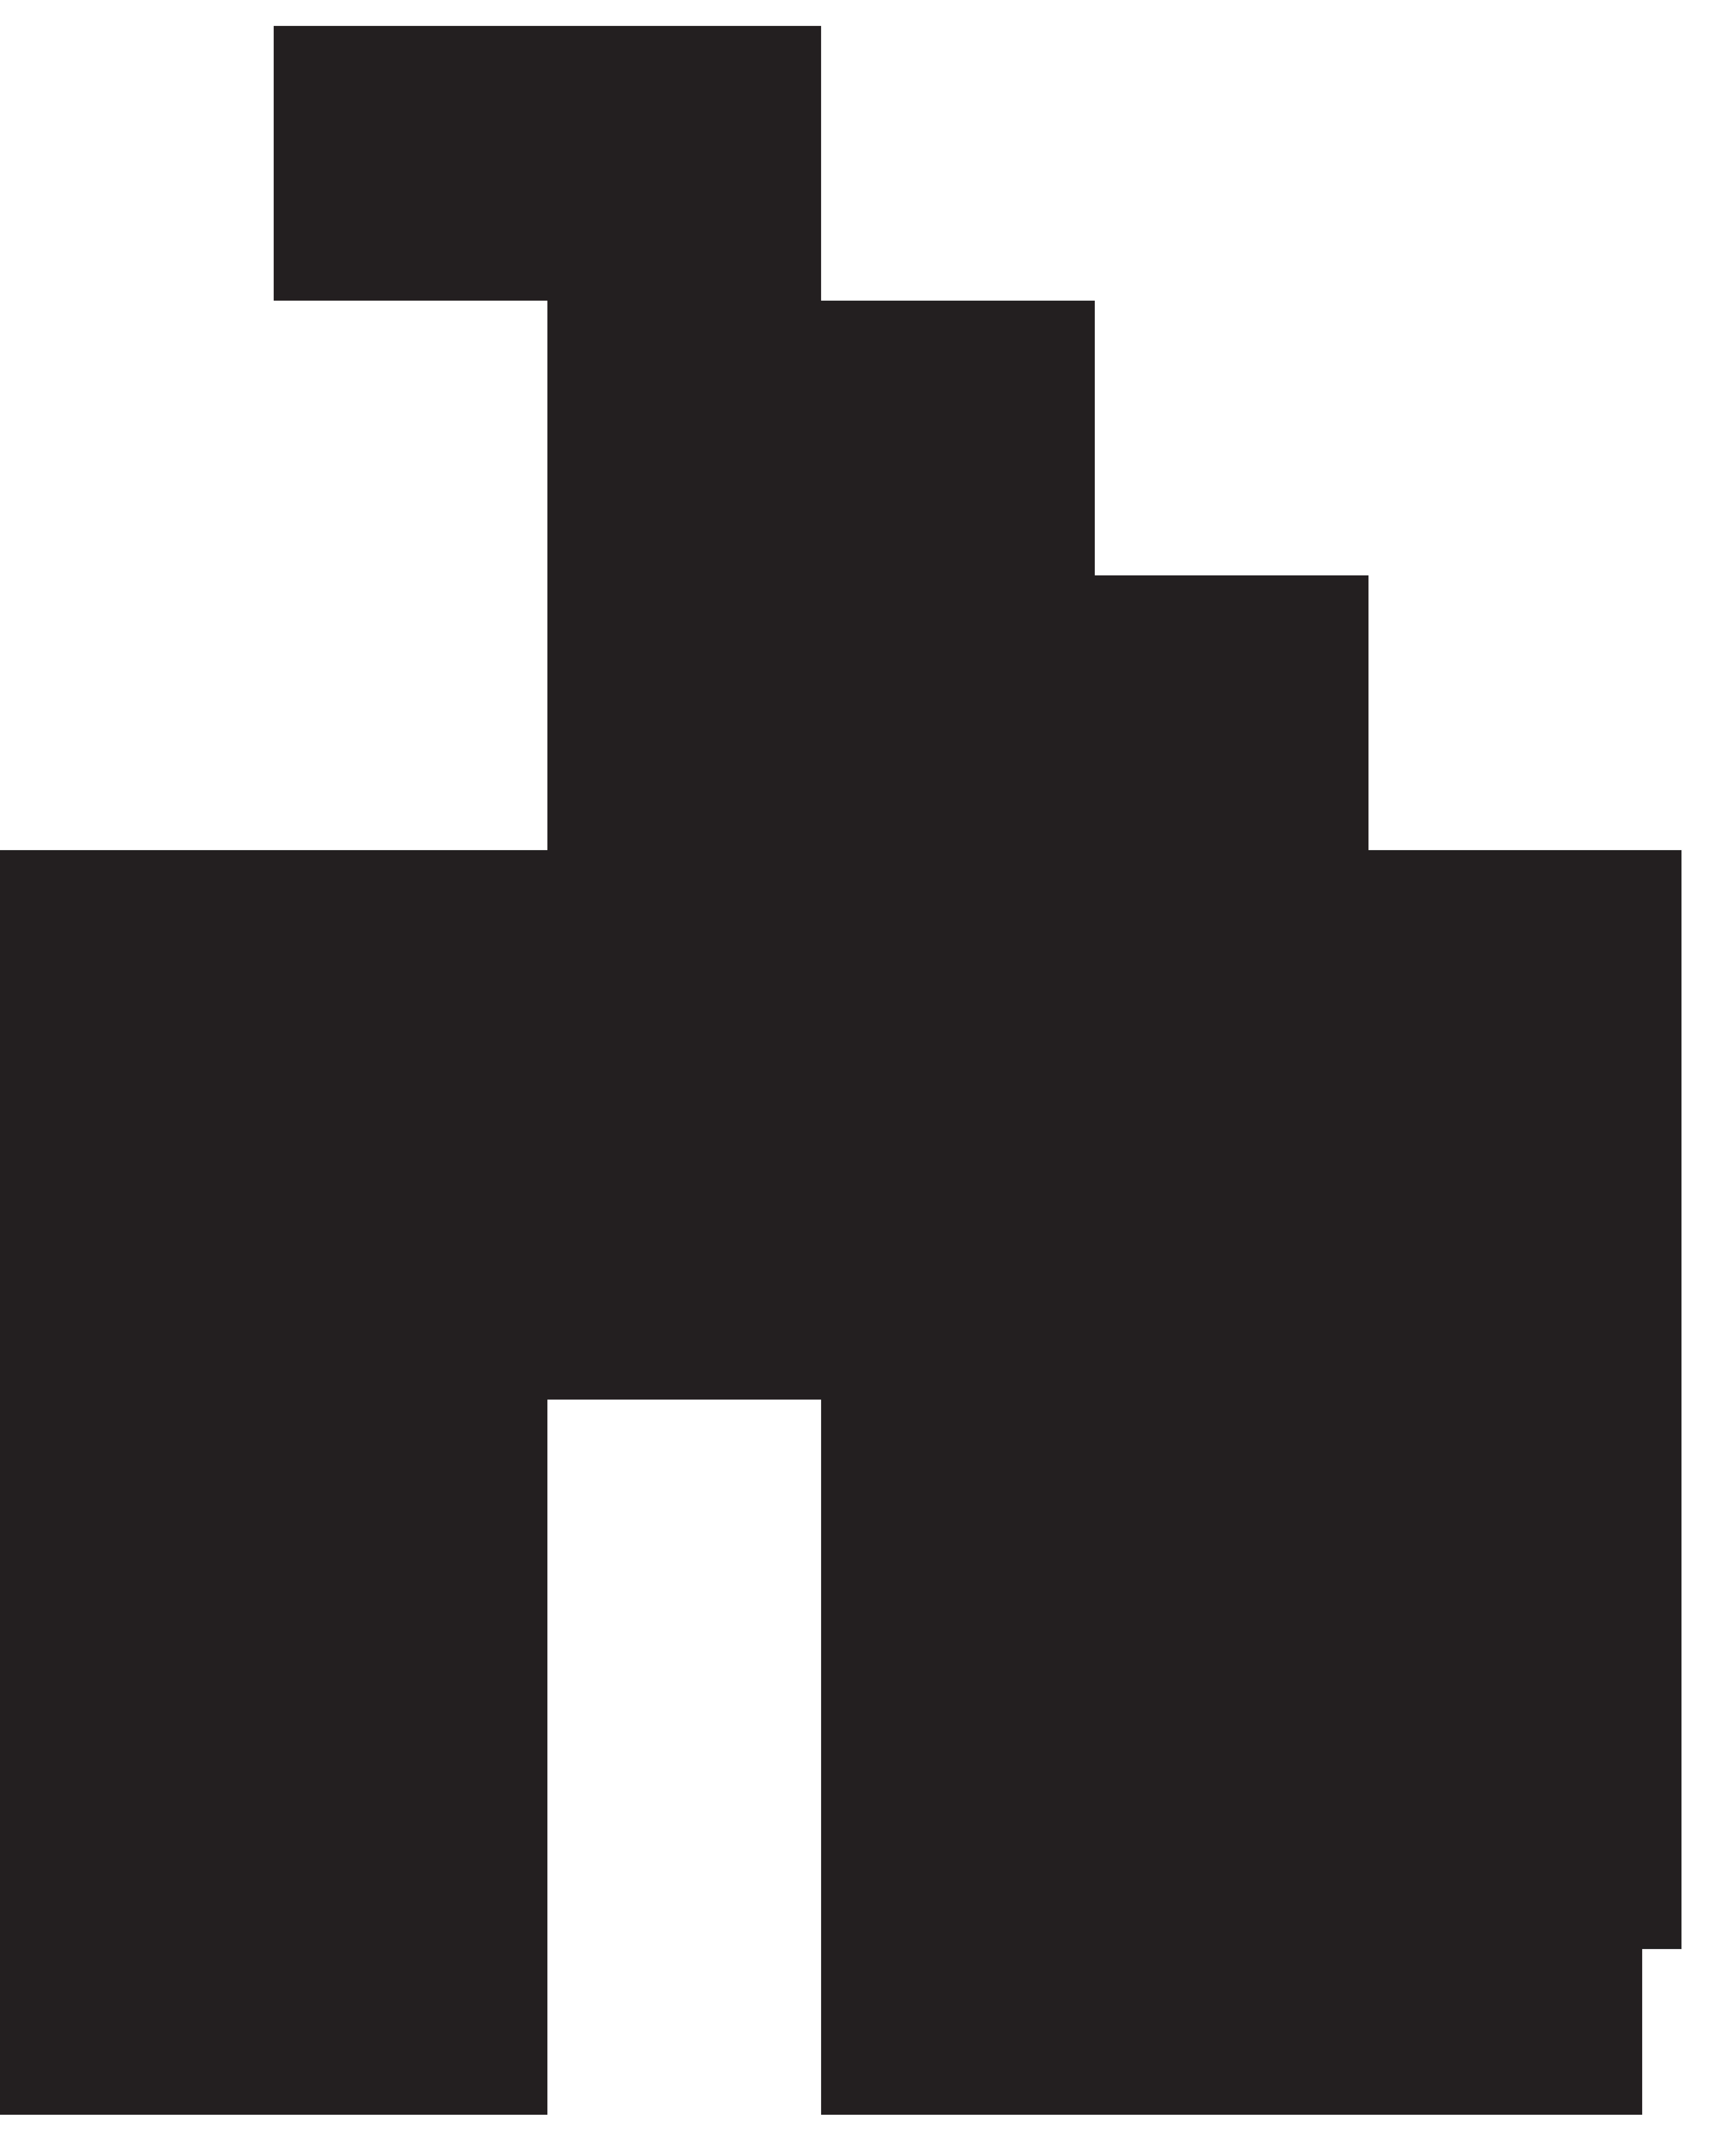 Giraffes silhouette png clip. Clipart zebra shadow